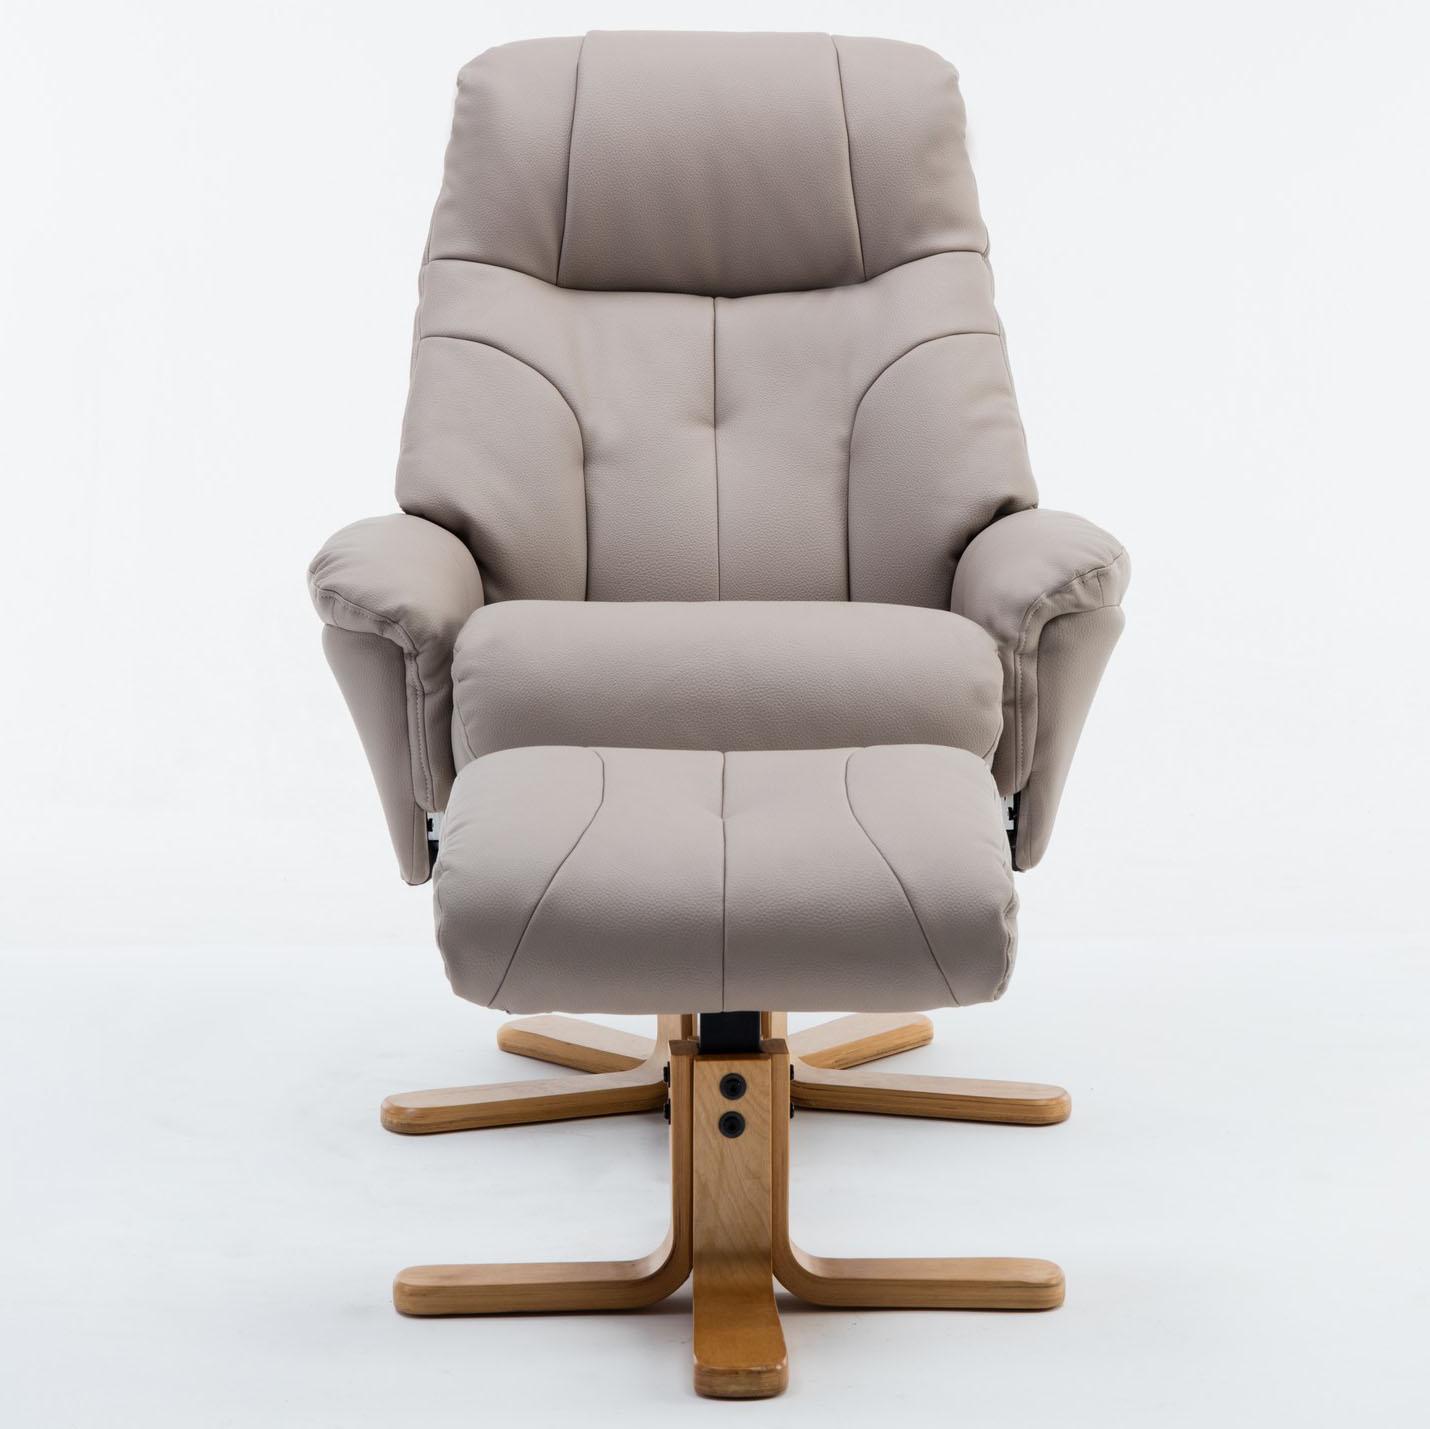 Dublin Chair & Stool Pebble Plush PU